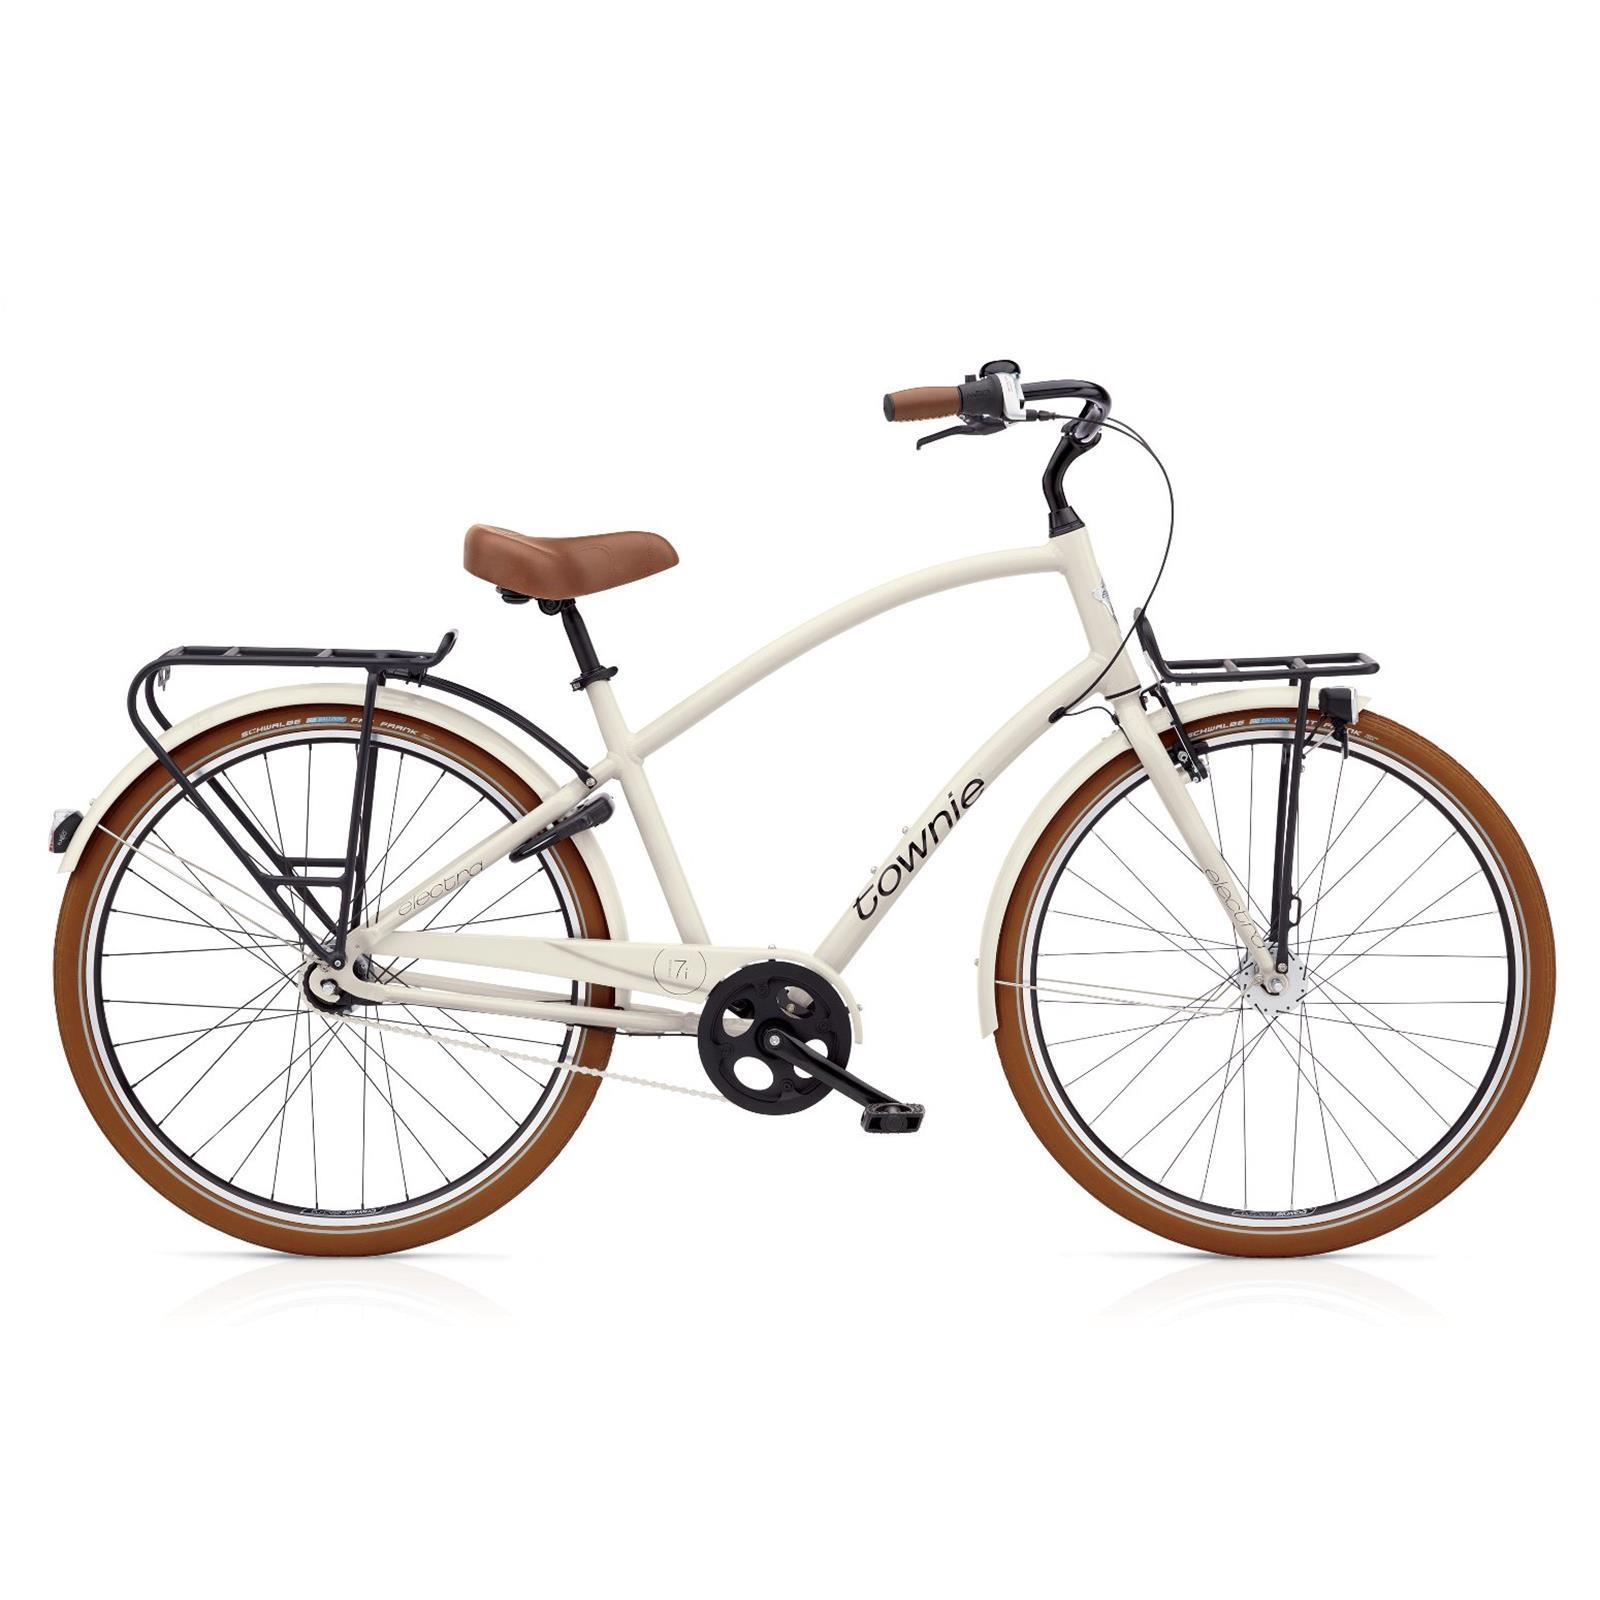 electra townie commute 7i eq herren fahrrad 28zoll beach cruiser rad beleuchtung ebay. Black Bedroom Furniture Sets. Home Design Ideas